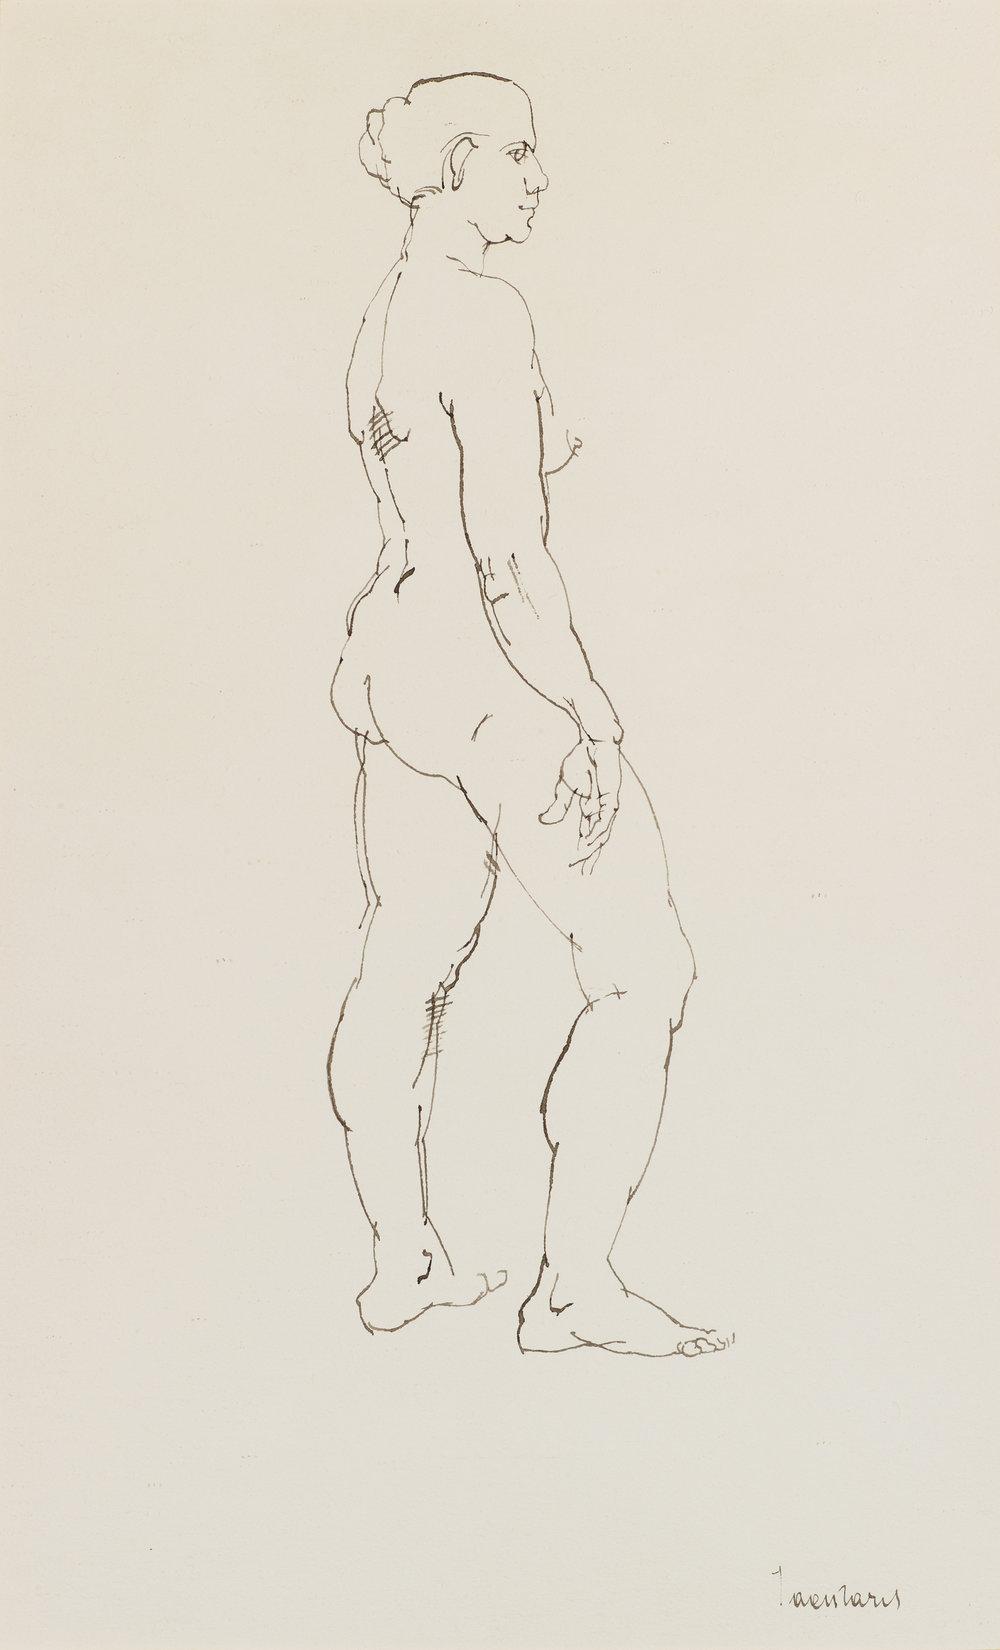 Untitled, 1950s  41 cm x 25 cm